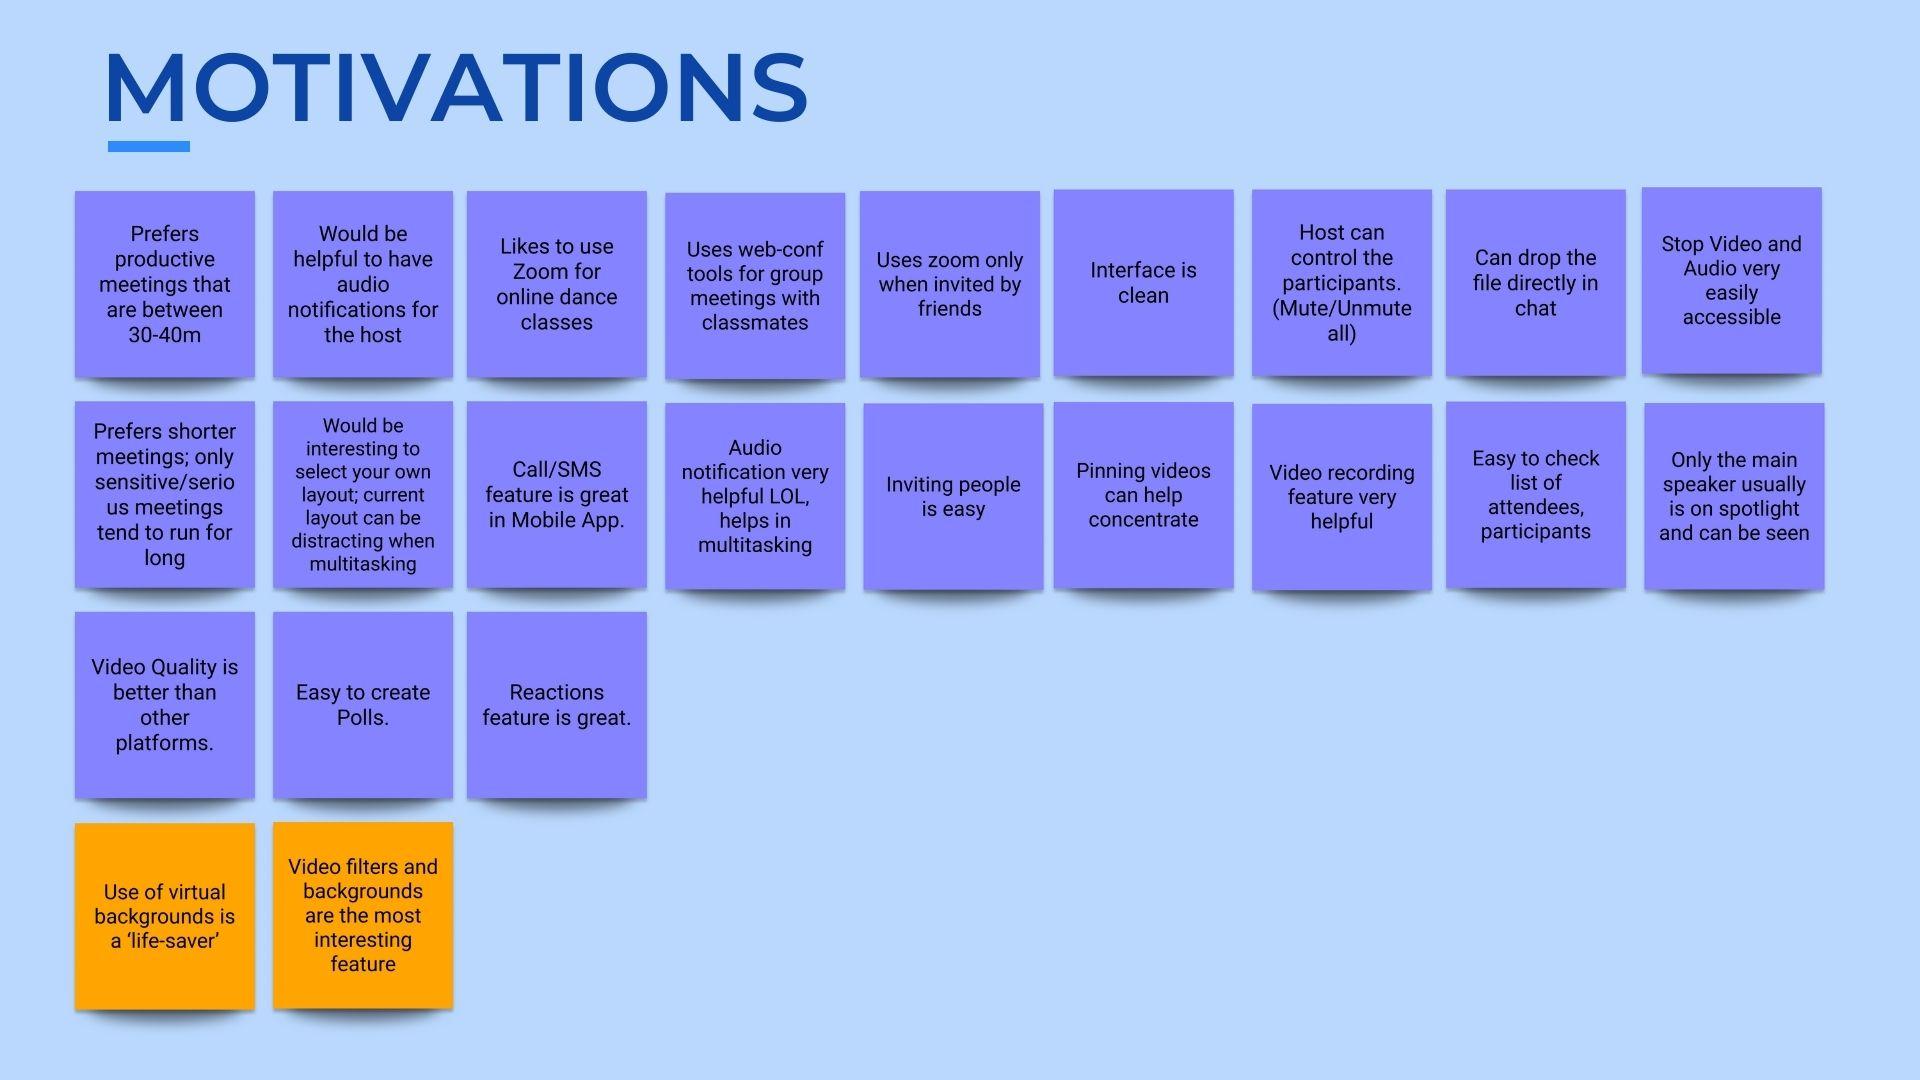 Zoom motivations analysis